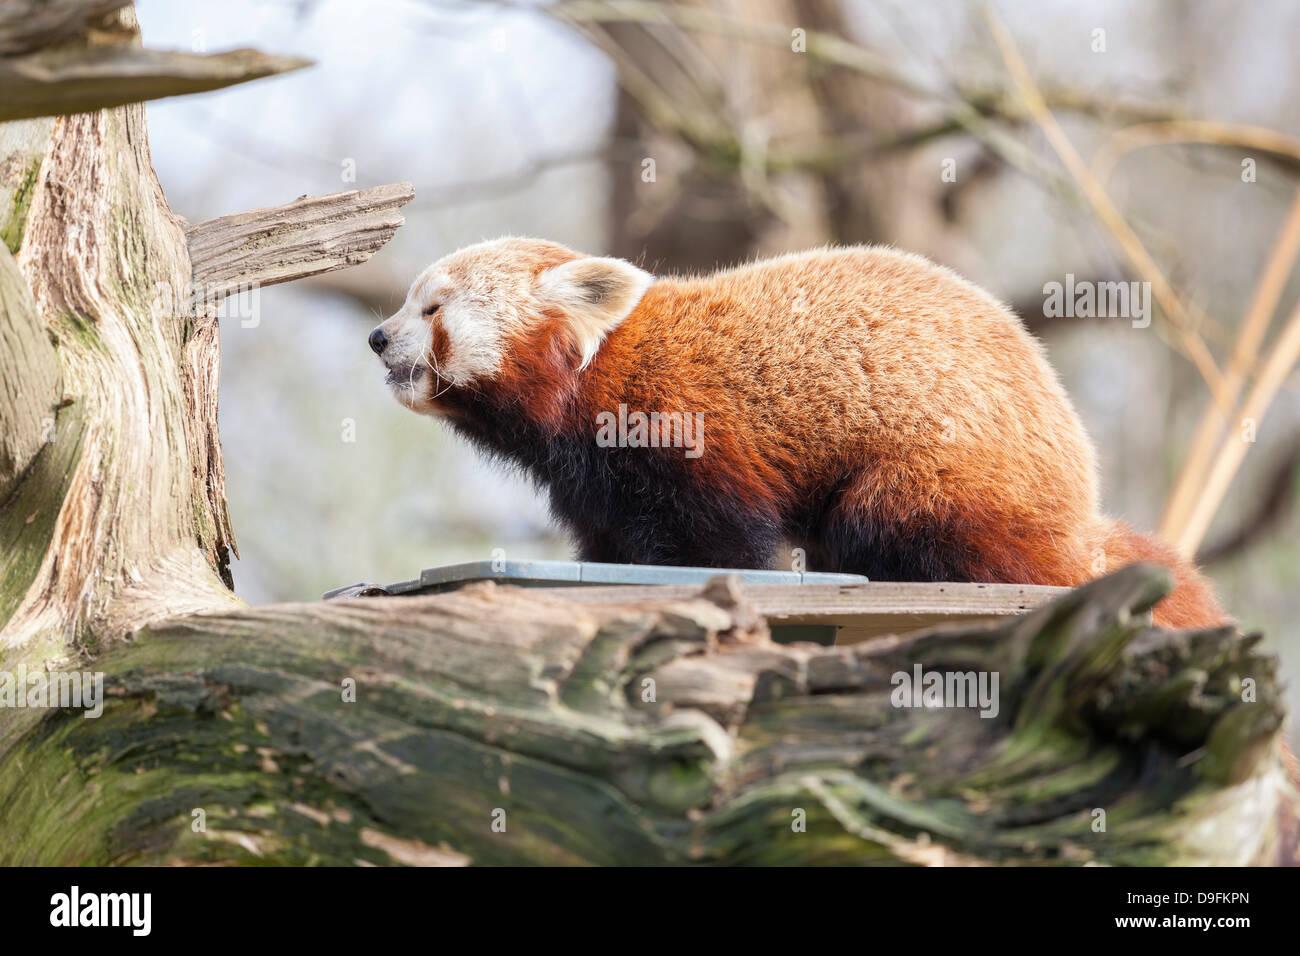 Red panda, Cotswold Wildlife Park, Costswolds, Gloucestershire, England, UK - Stock Image